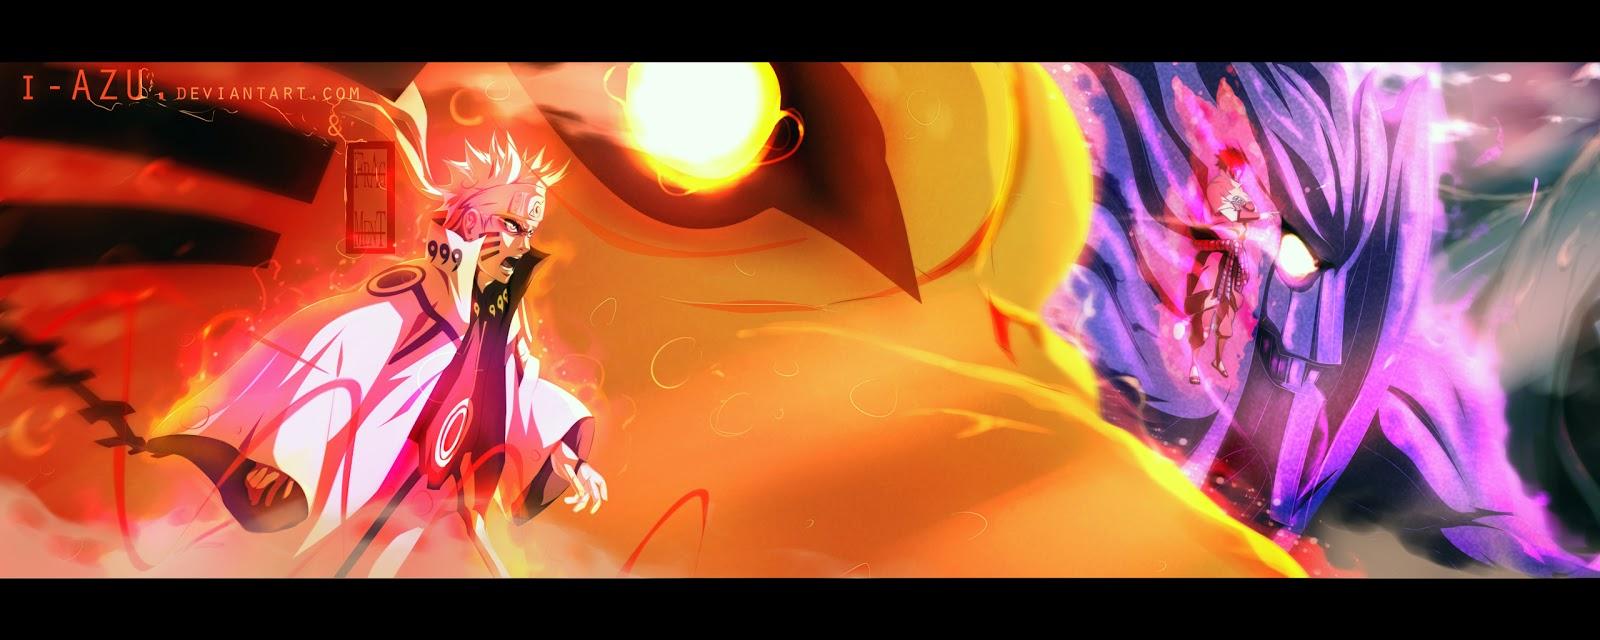 Free Download Susanoo Deviant Art Shippuden Anime Wallpaper Hd H05